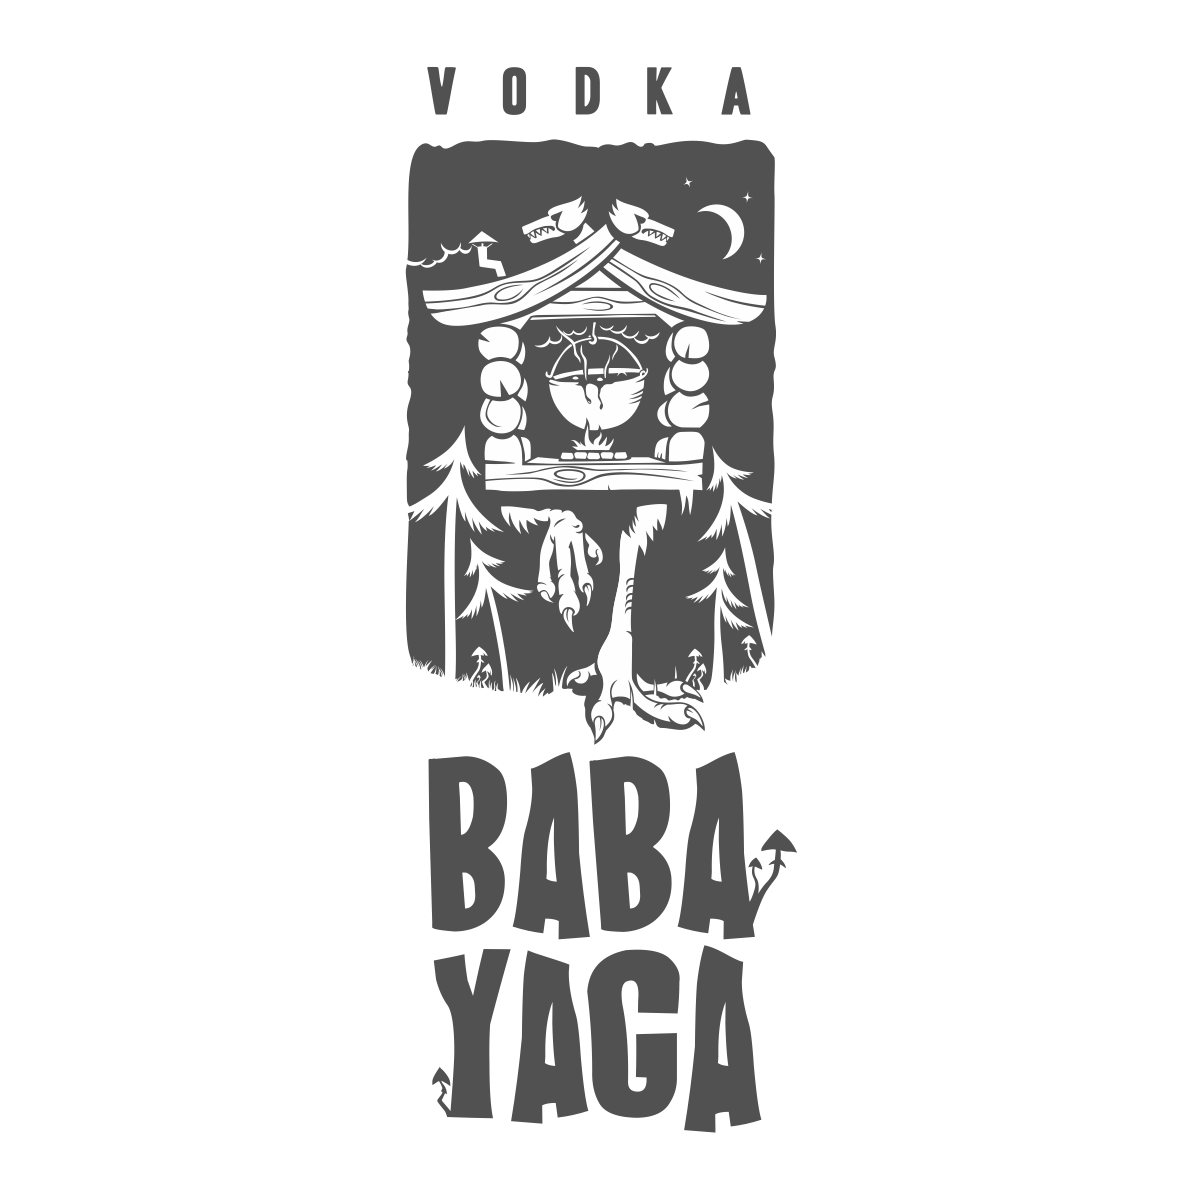 Baba Yaga Vodka Black and White